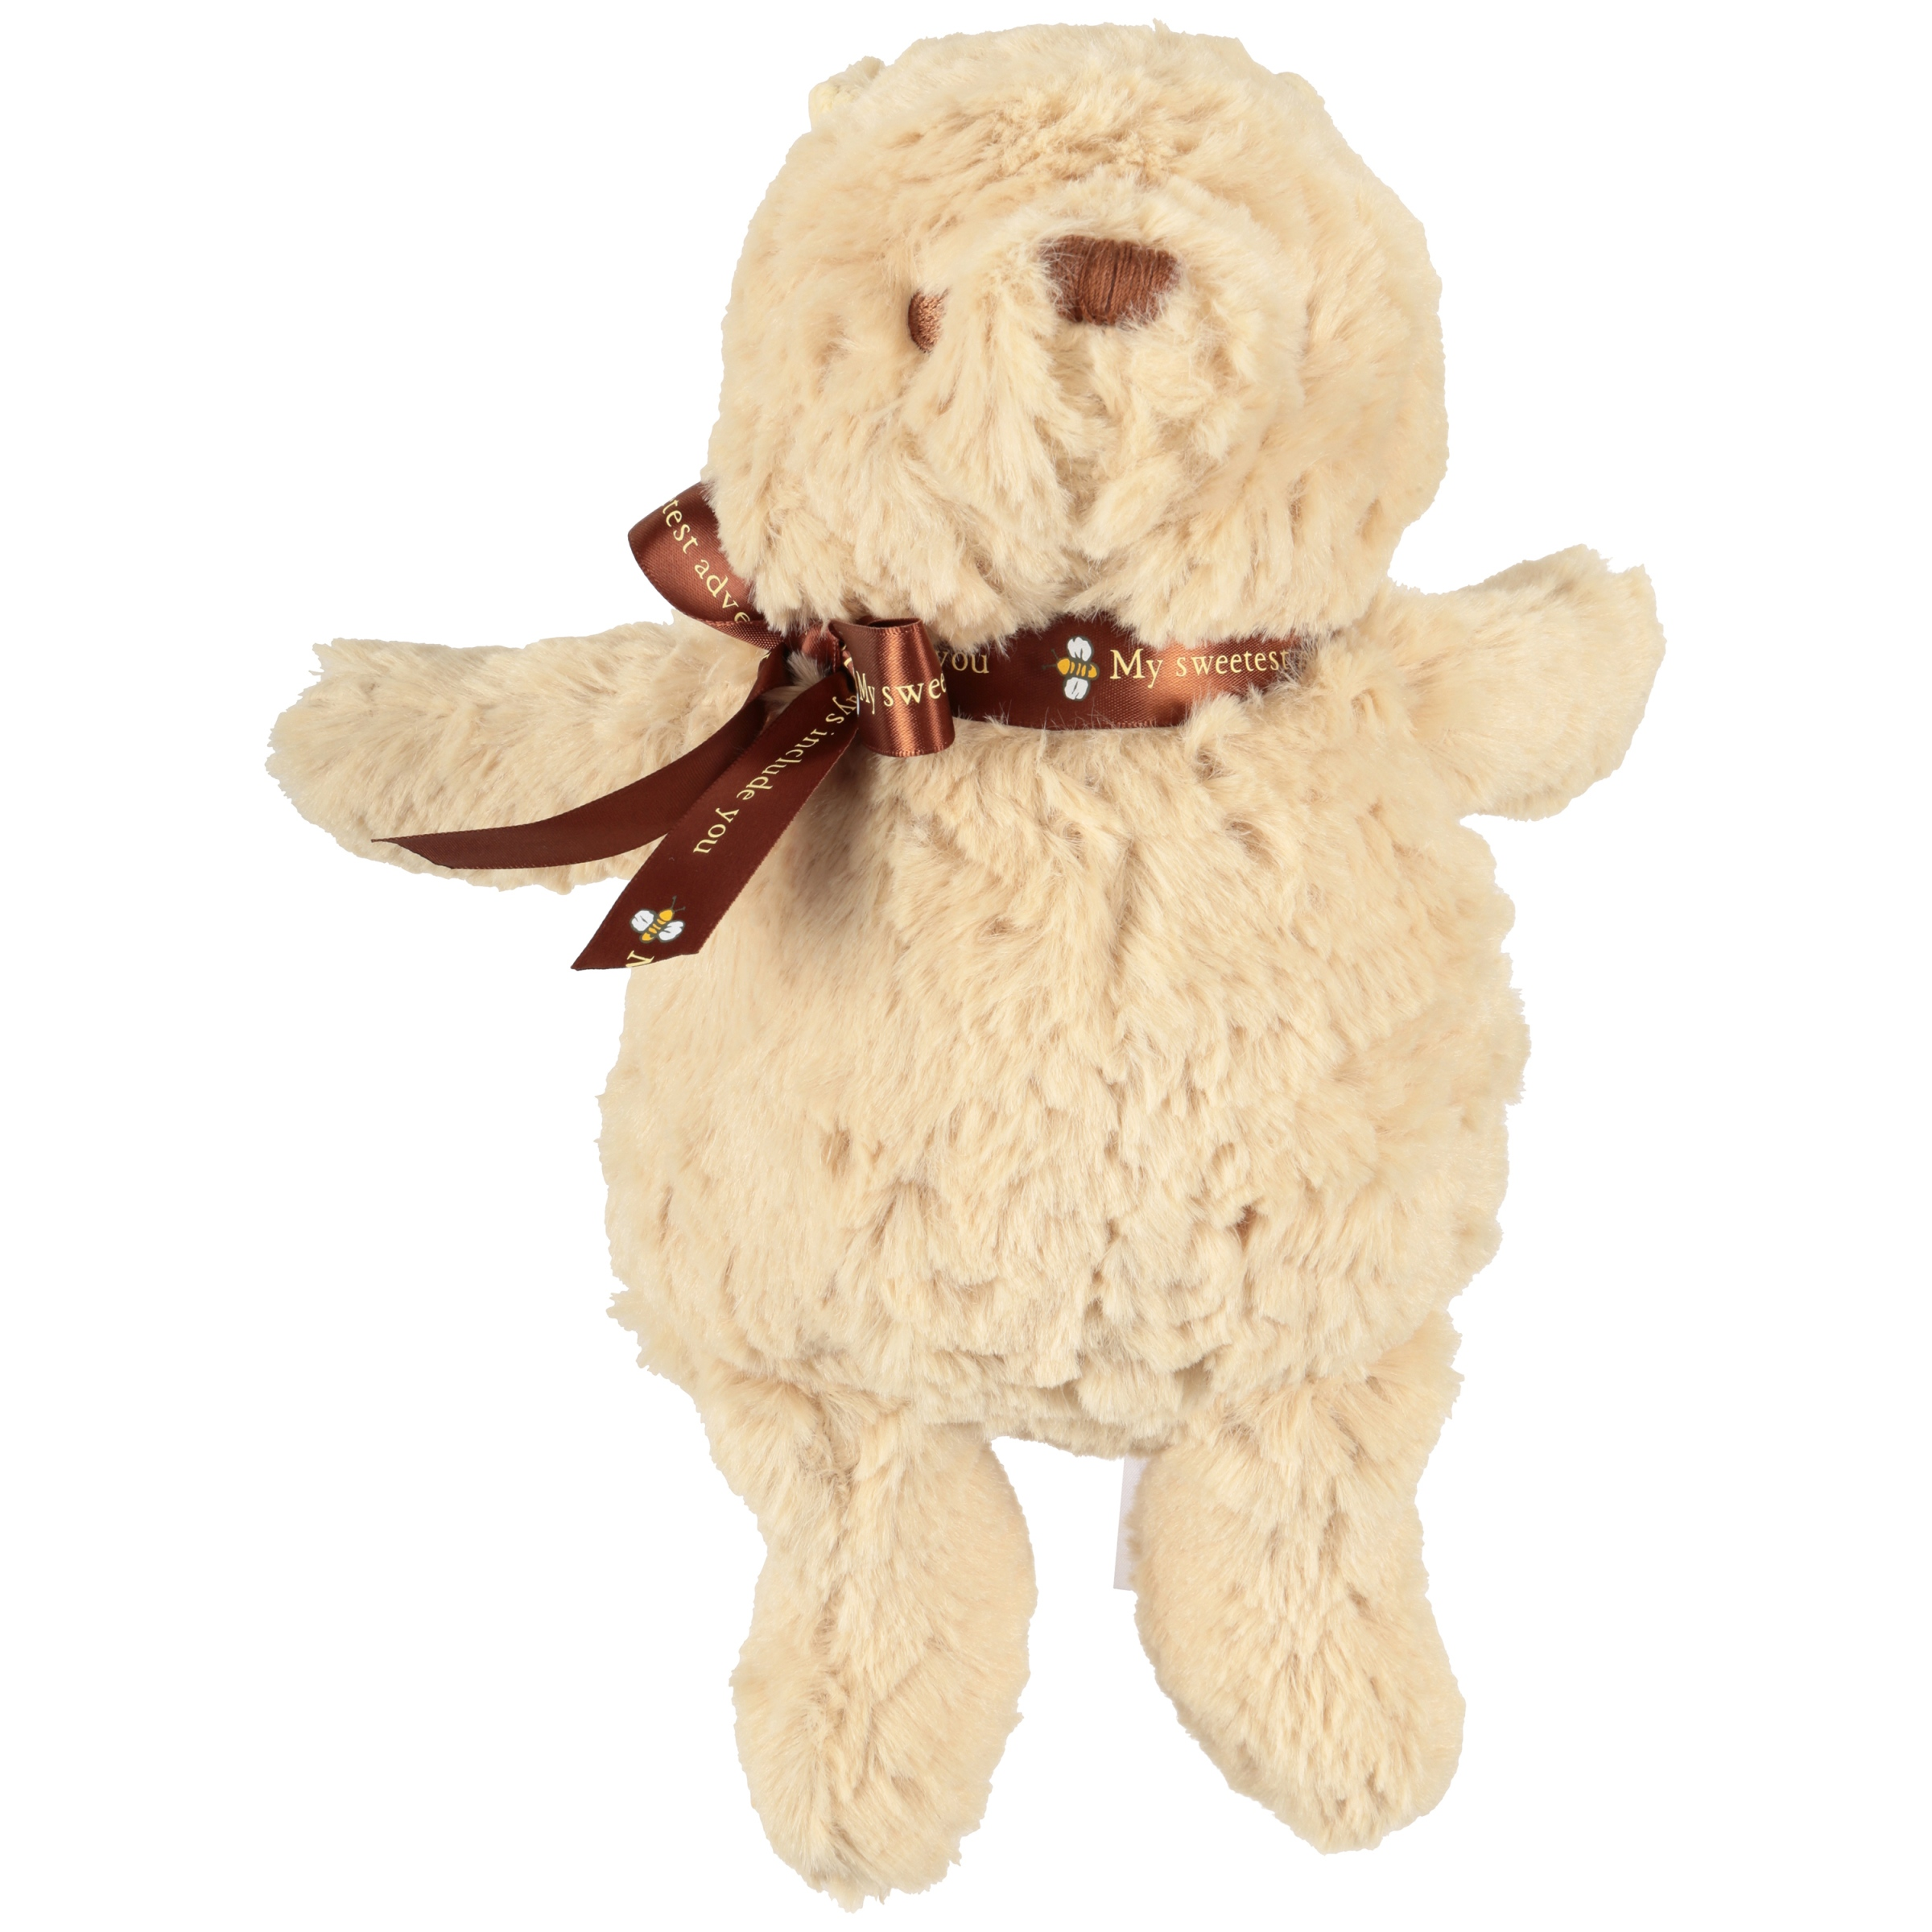 Disney Baby Classic Winnie The Pooh Teddy Bear Plush Toy - Walmart.com